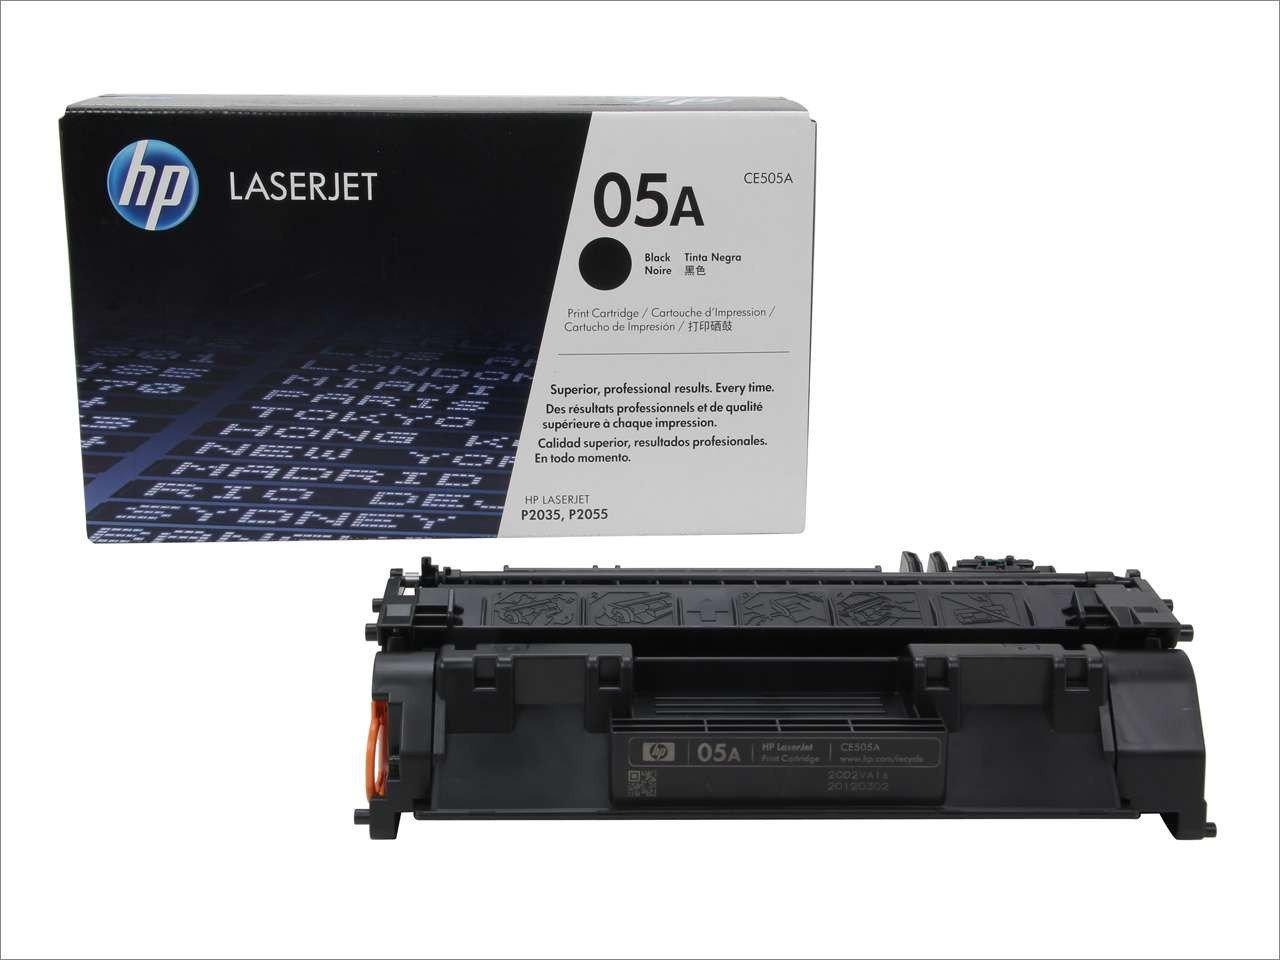 Заправка картриджа HP 05A для HP LaserJet P2035 (CE461A)/ P2035n (CE462A)/ P2055 (CE456A)/ P2055d (CE457A)/ P2055dn/ P2055dn (CE459A)/ P2055d (CE457AR)